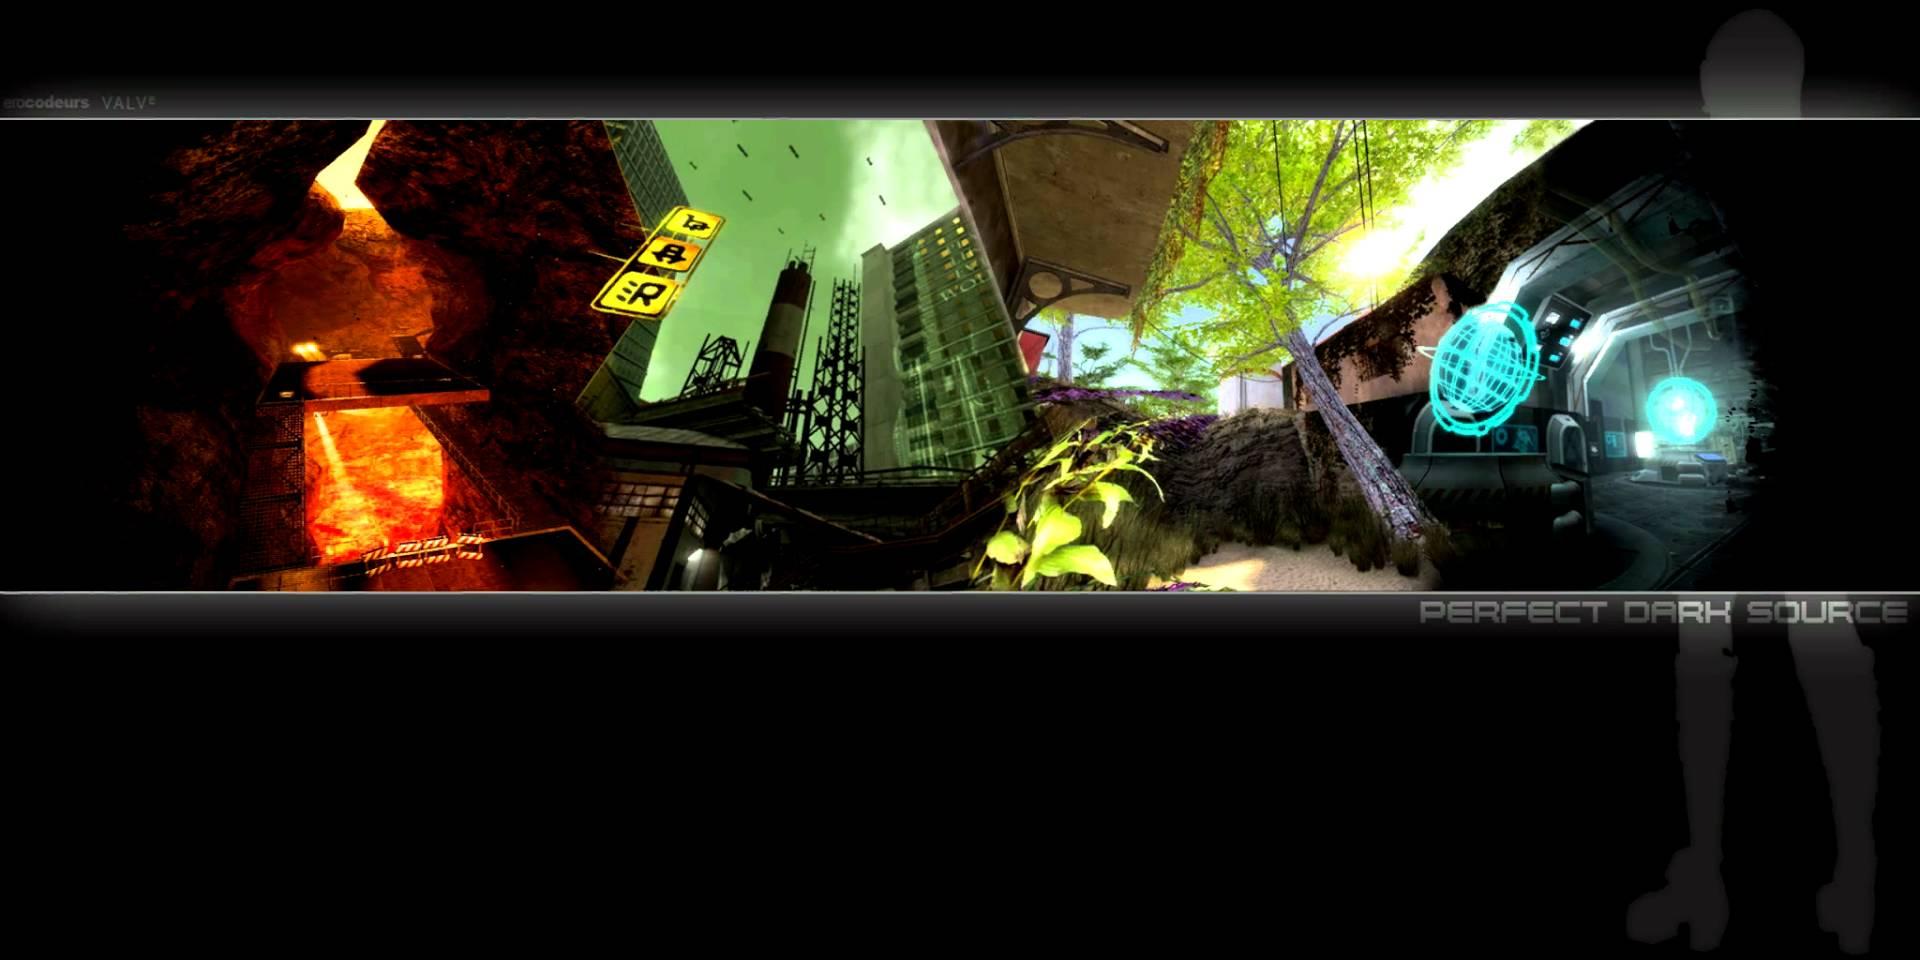 HQ Perfect Dark: Source Wallpapers | File 133.24Kb